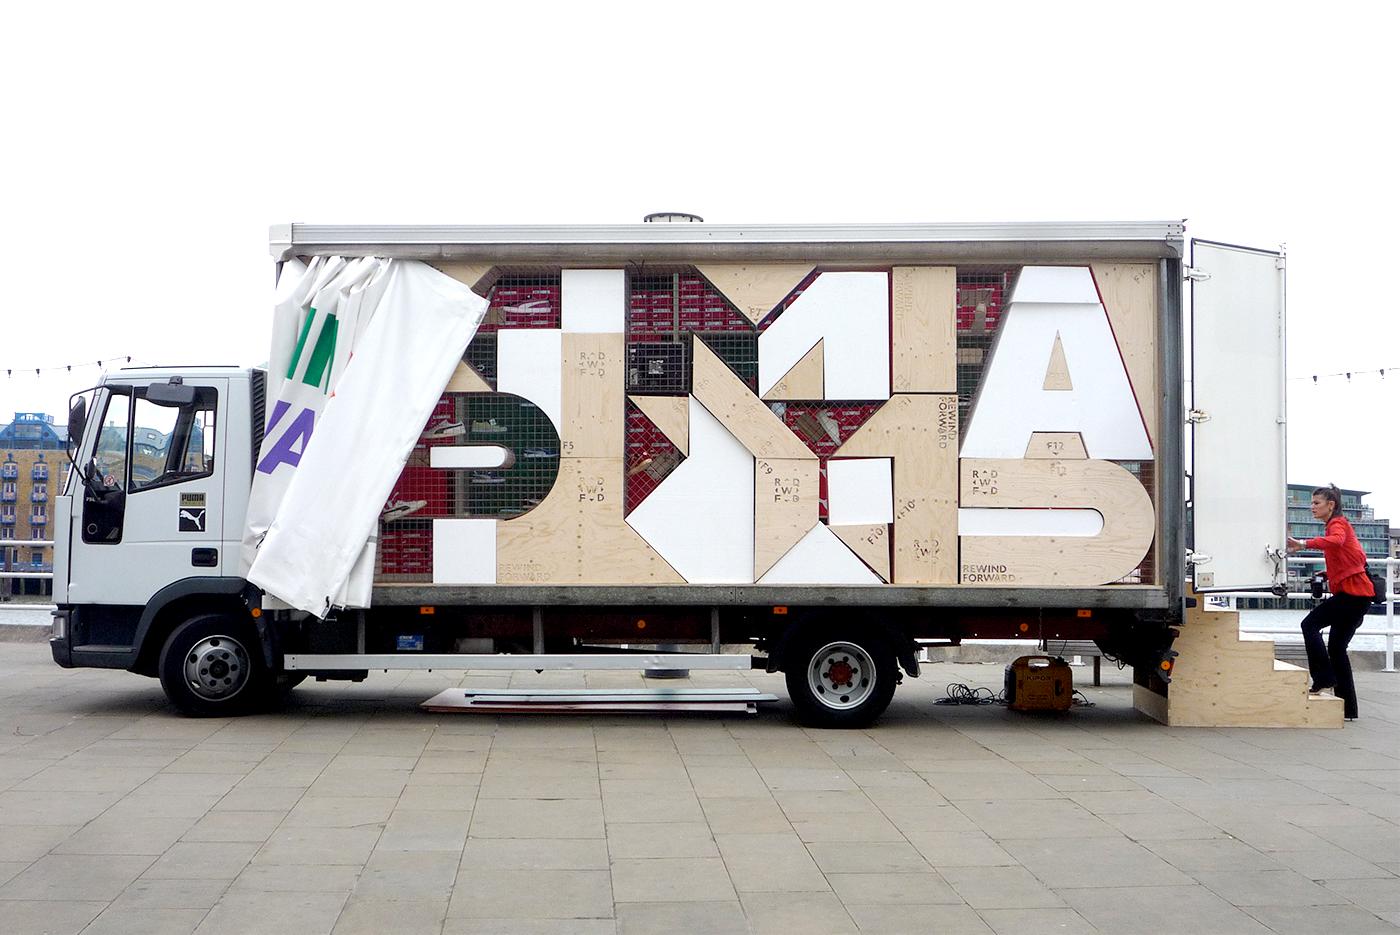 puma pop-out Truck rewind forward